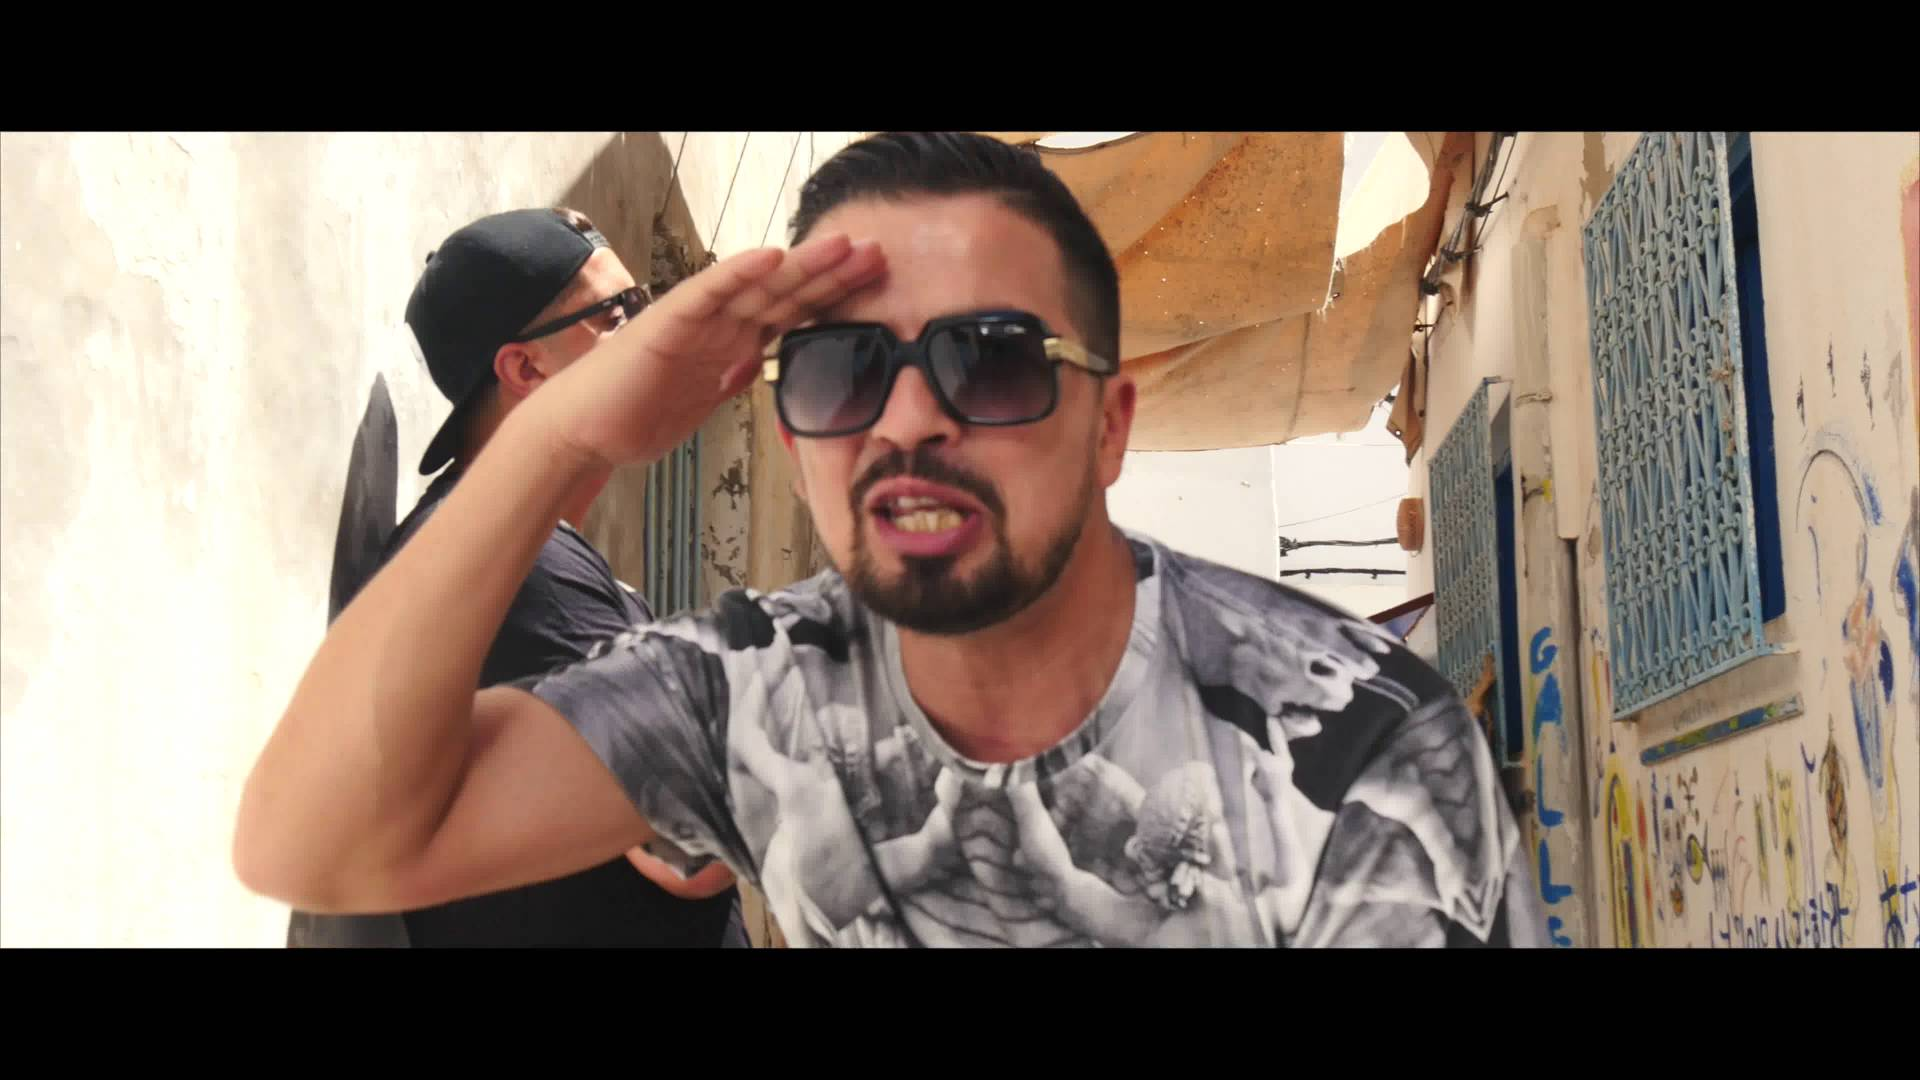 DJ Meyz Ft Balti, Tunisiano – Maman J'suis La